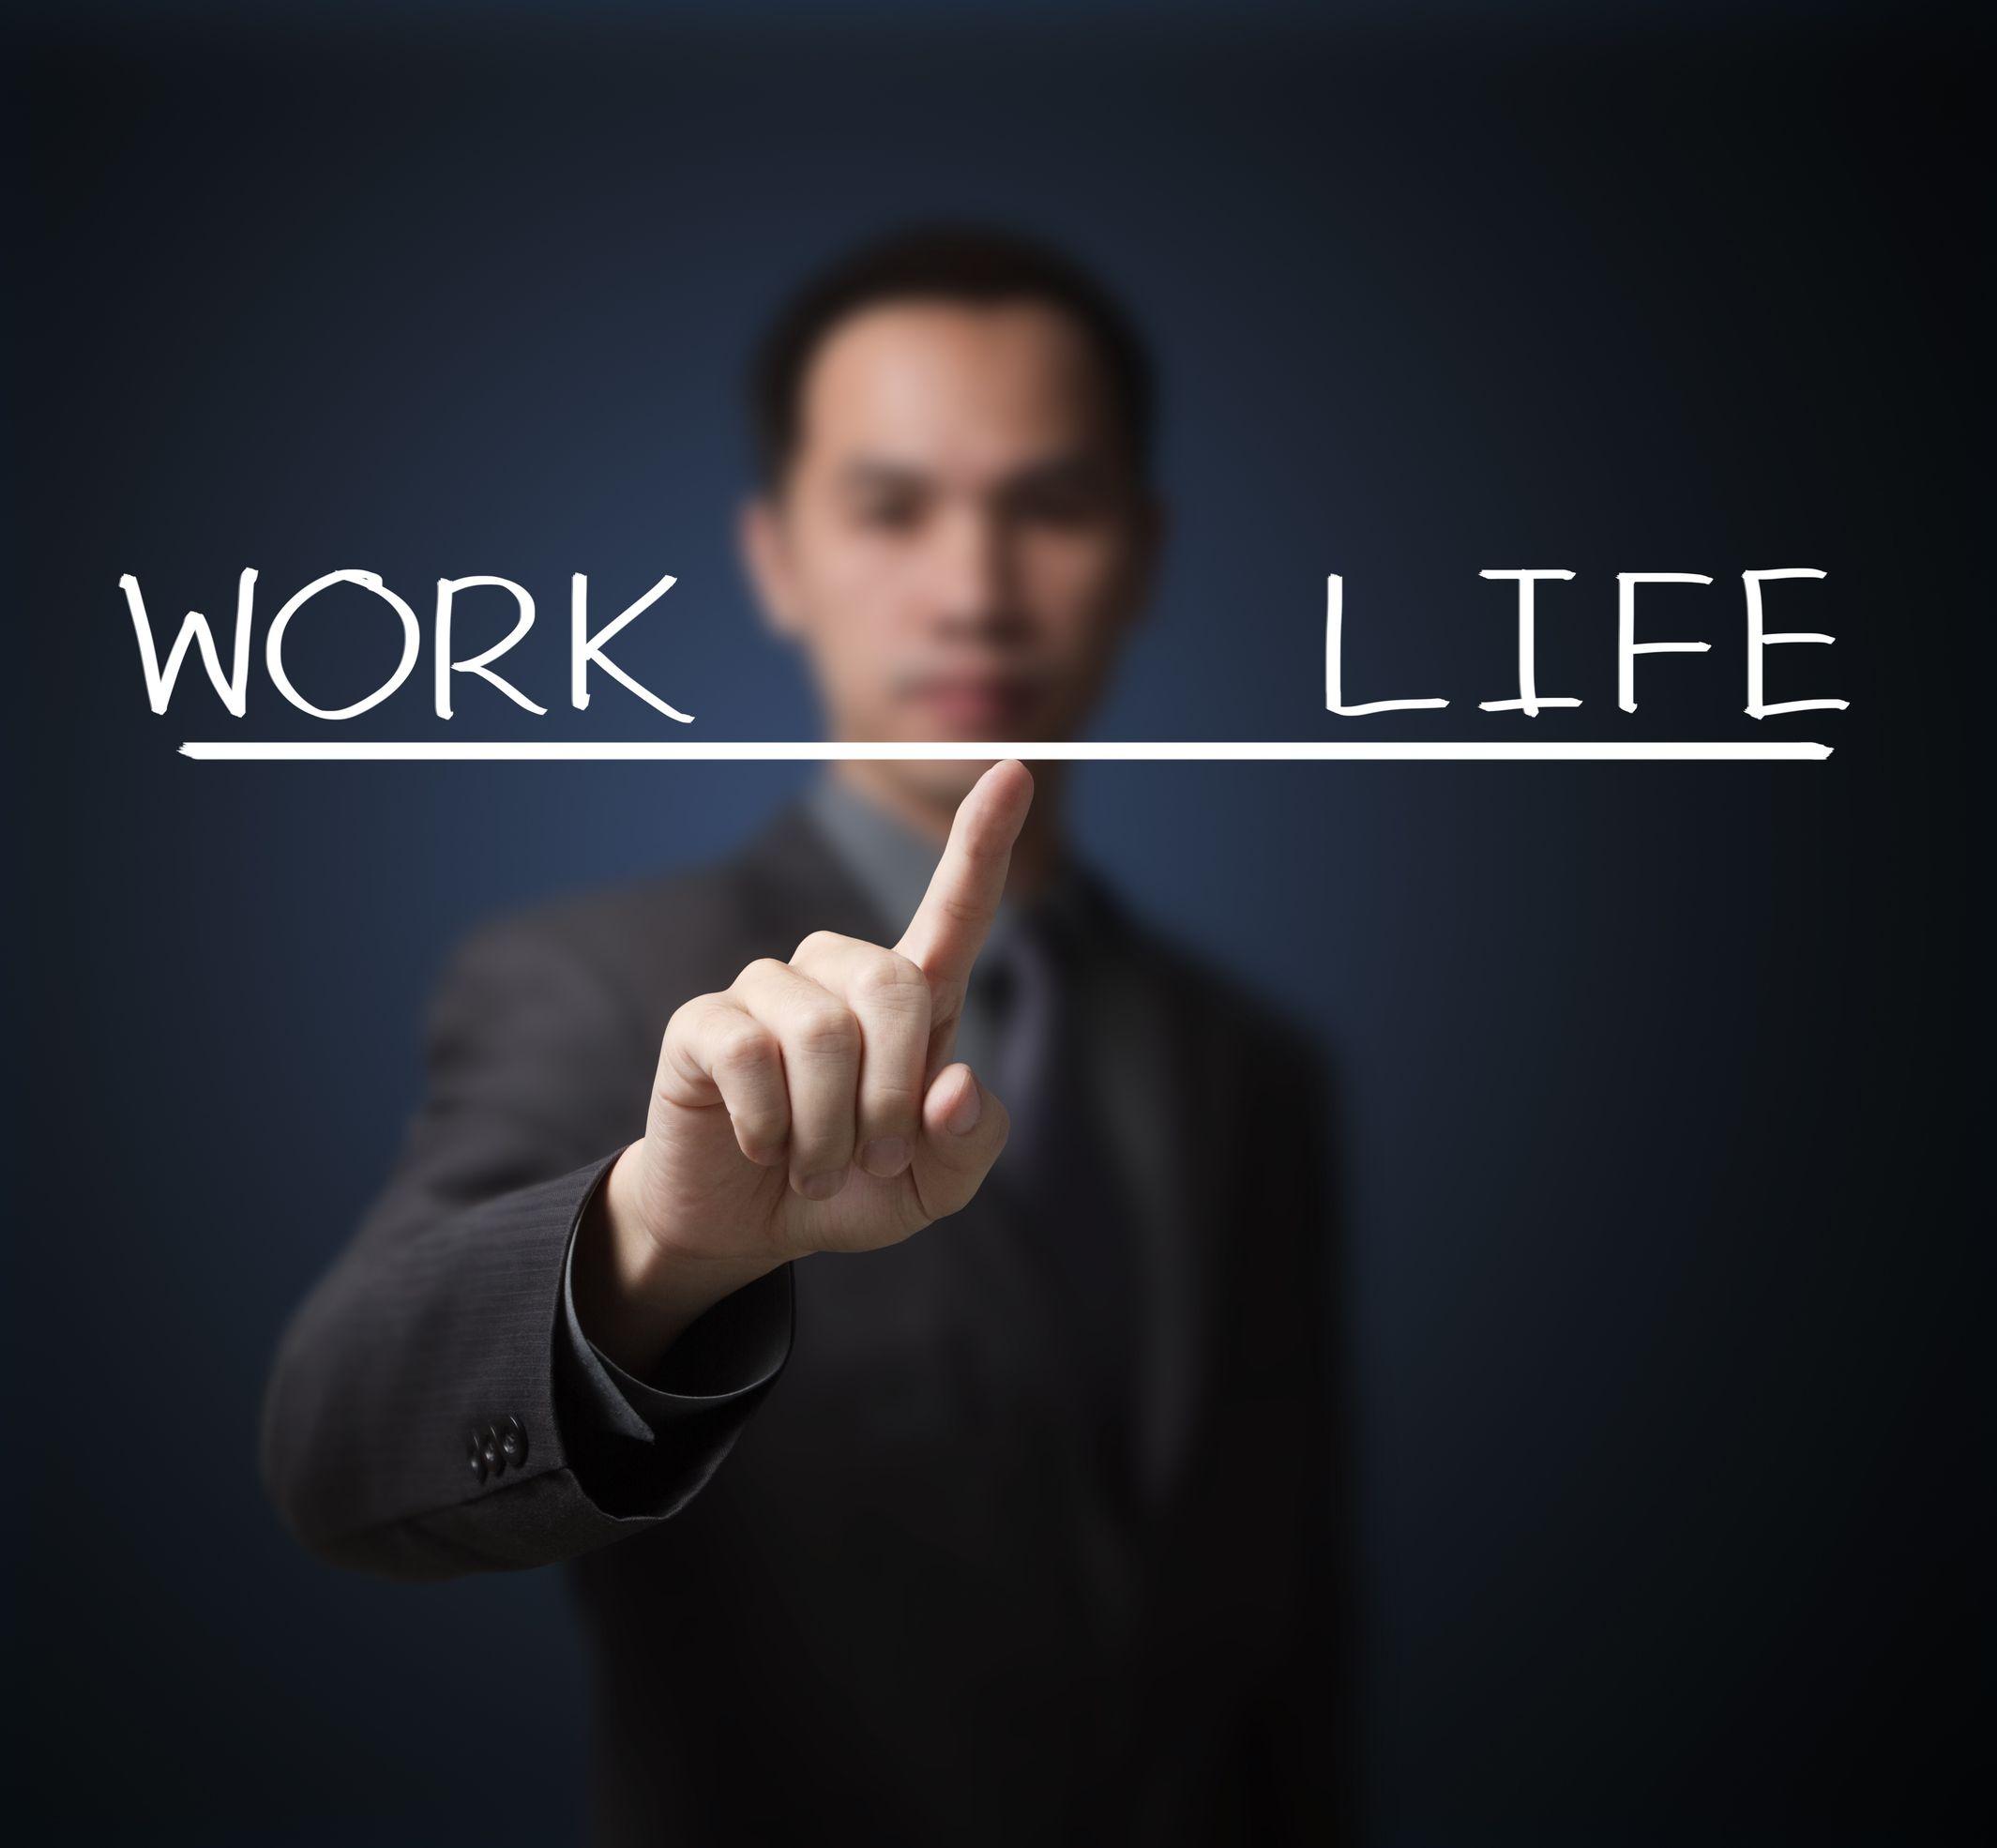 Balance Improving Work Life Balance